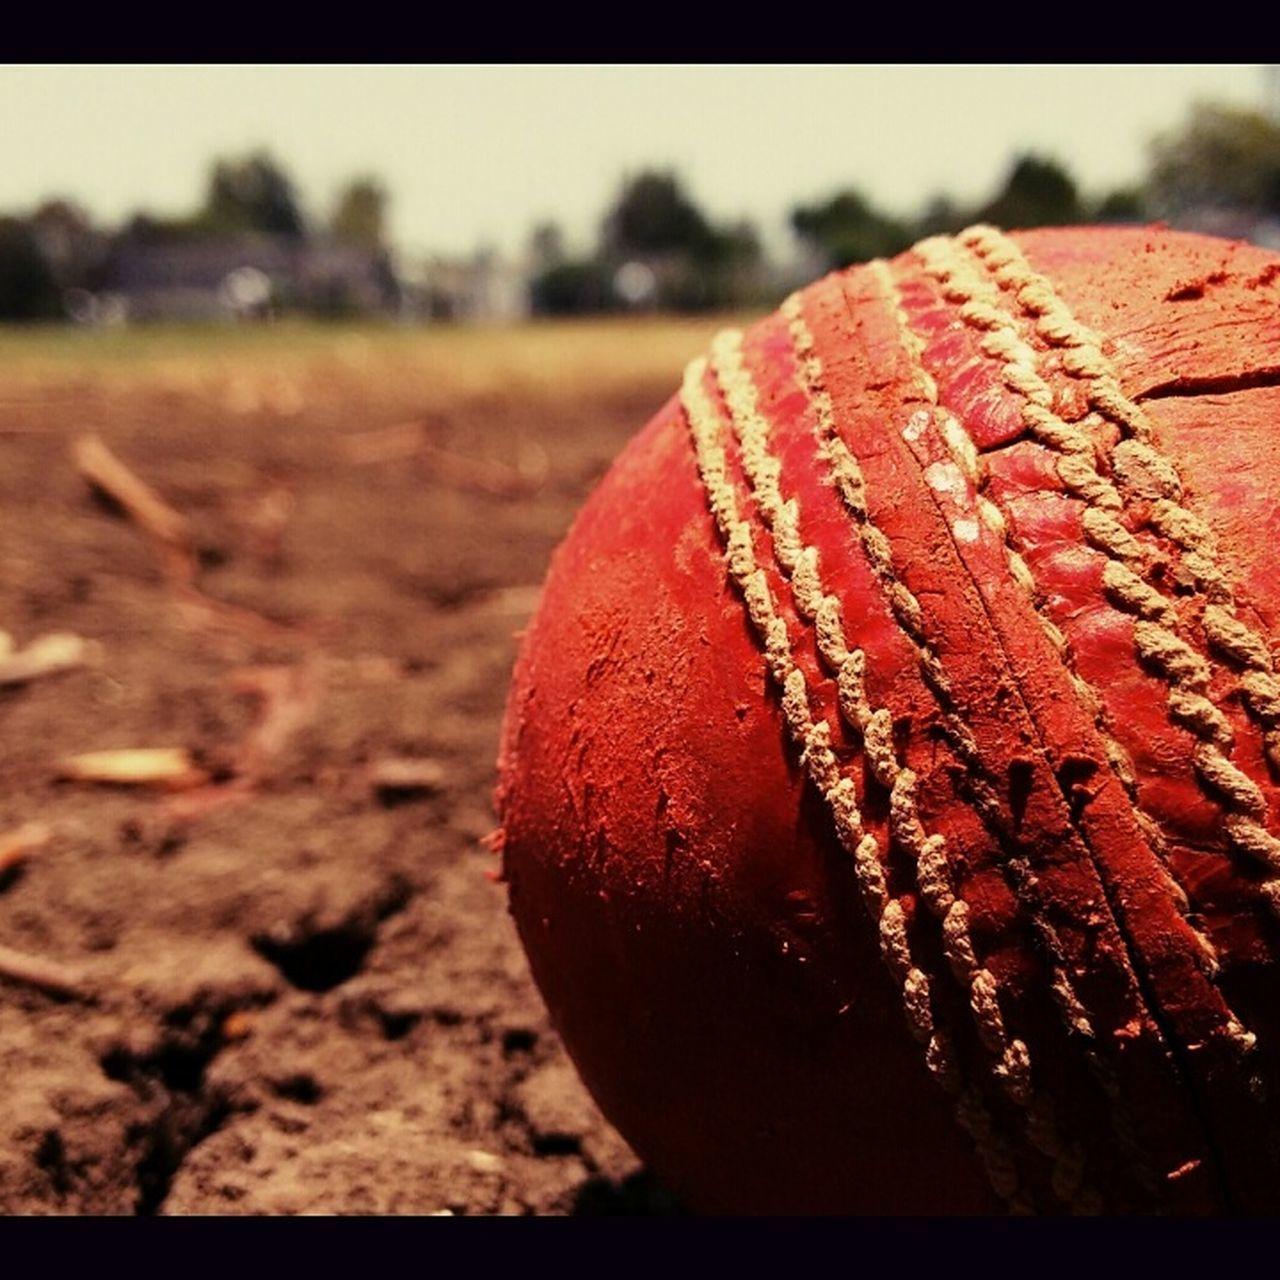 season of cricket vivo ipl 2017!!!! Blurred Background Close-up Cricket Field Focus On Foreground Ipl 2017 Outdoors Photography Season Of Cricekt